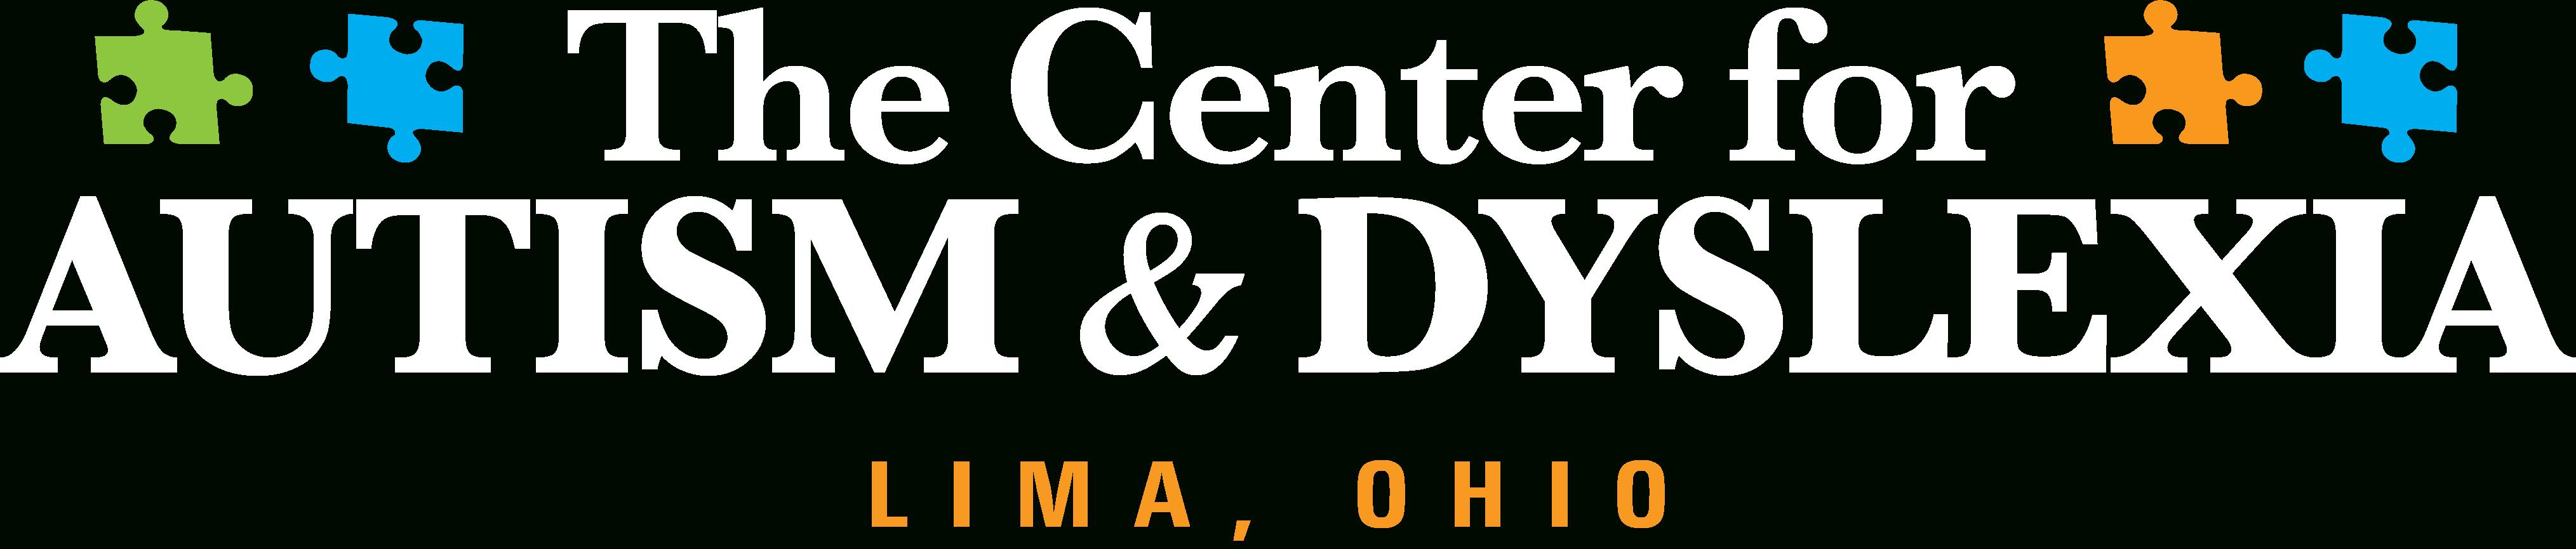 Center For Autism & Dyslexia: Lima – Sesi With University Of Findlay Academic Calendar 2021